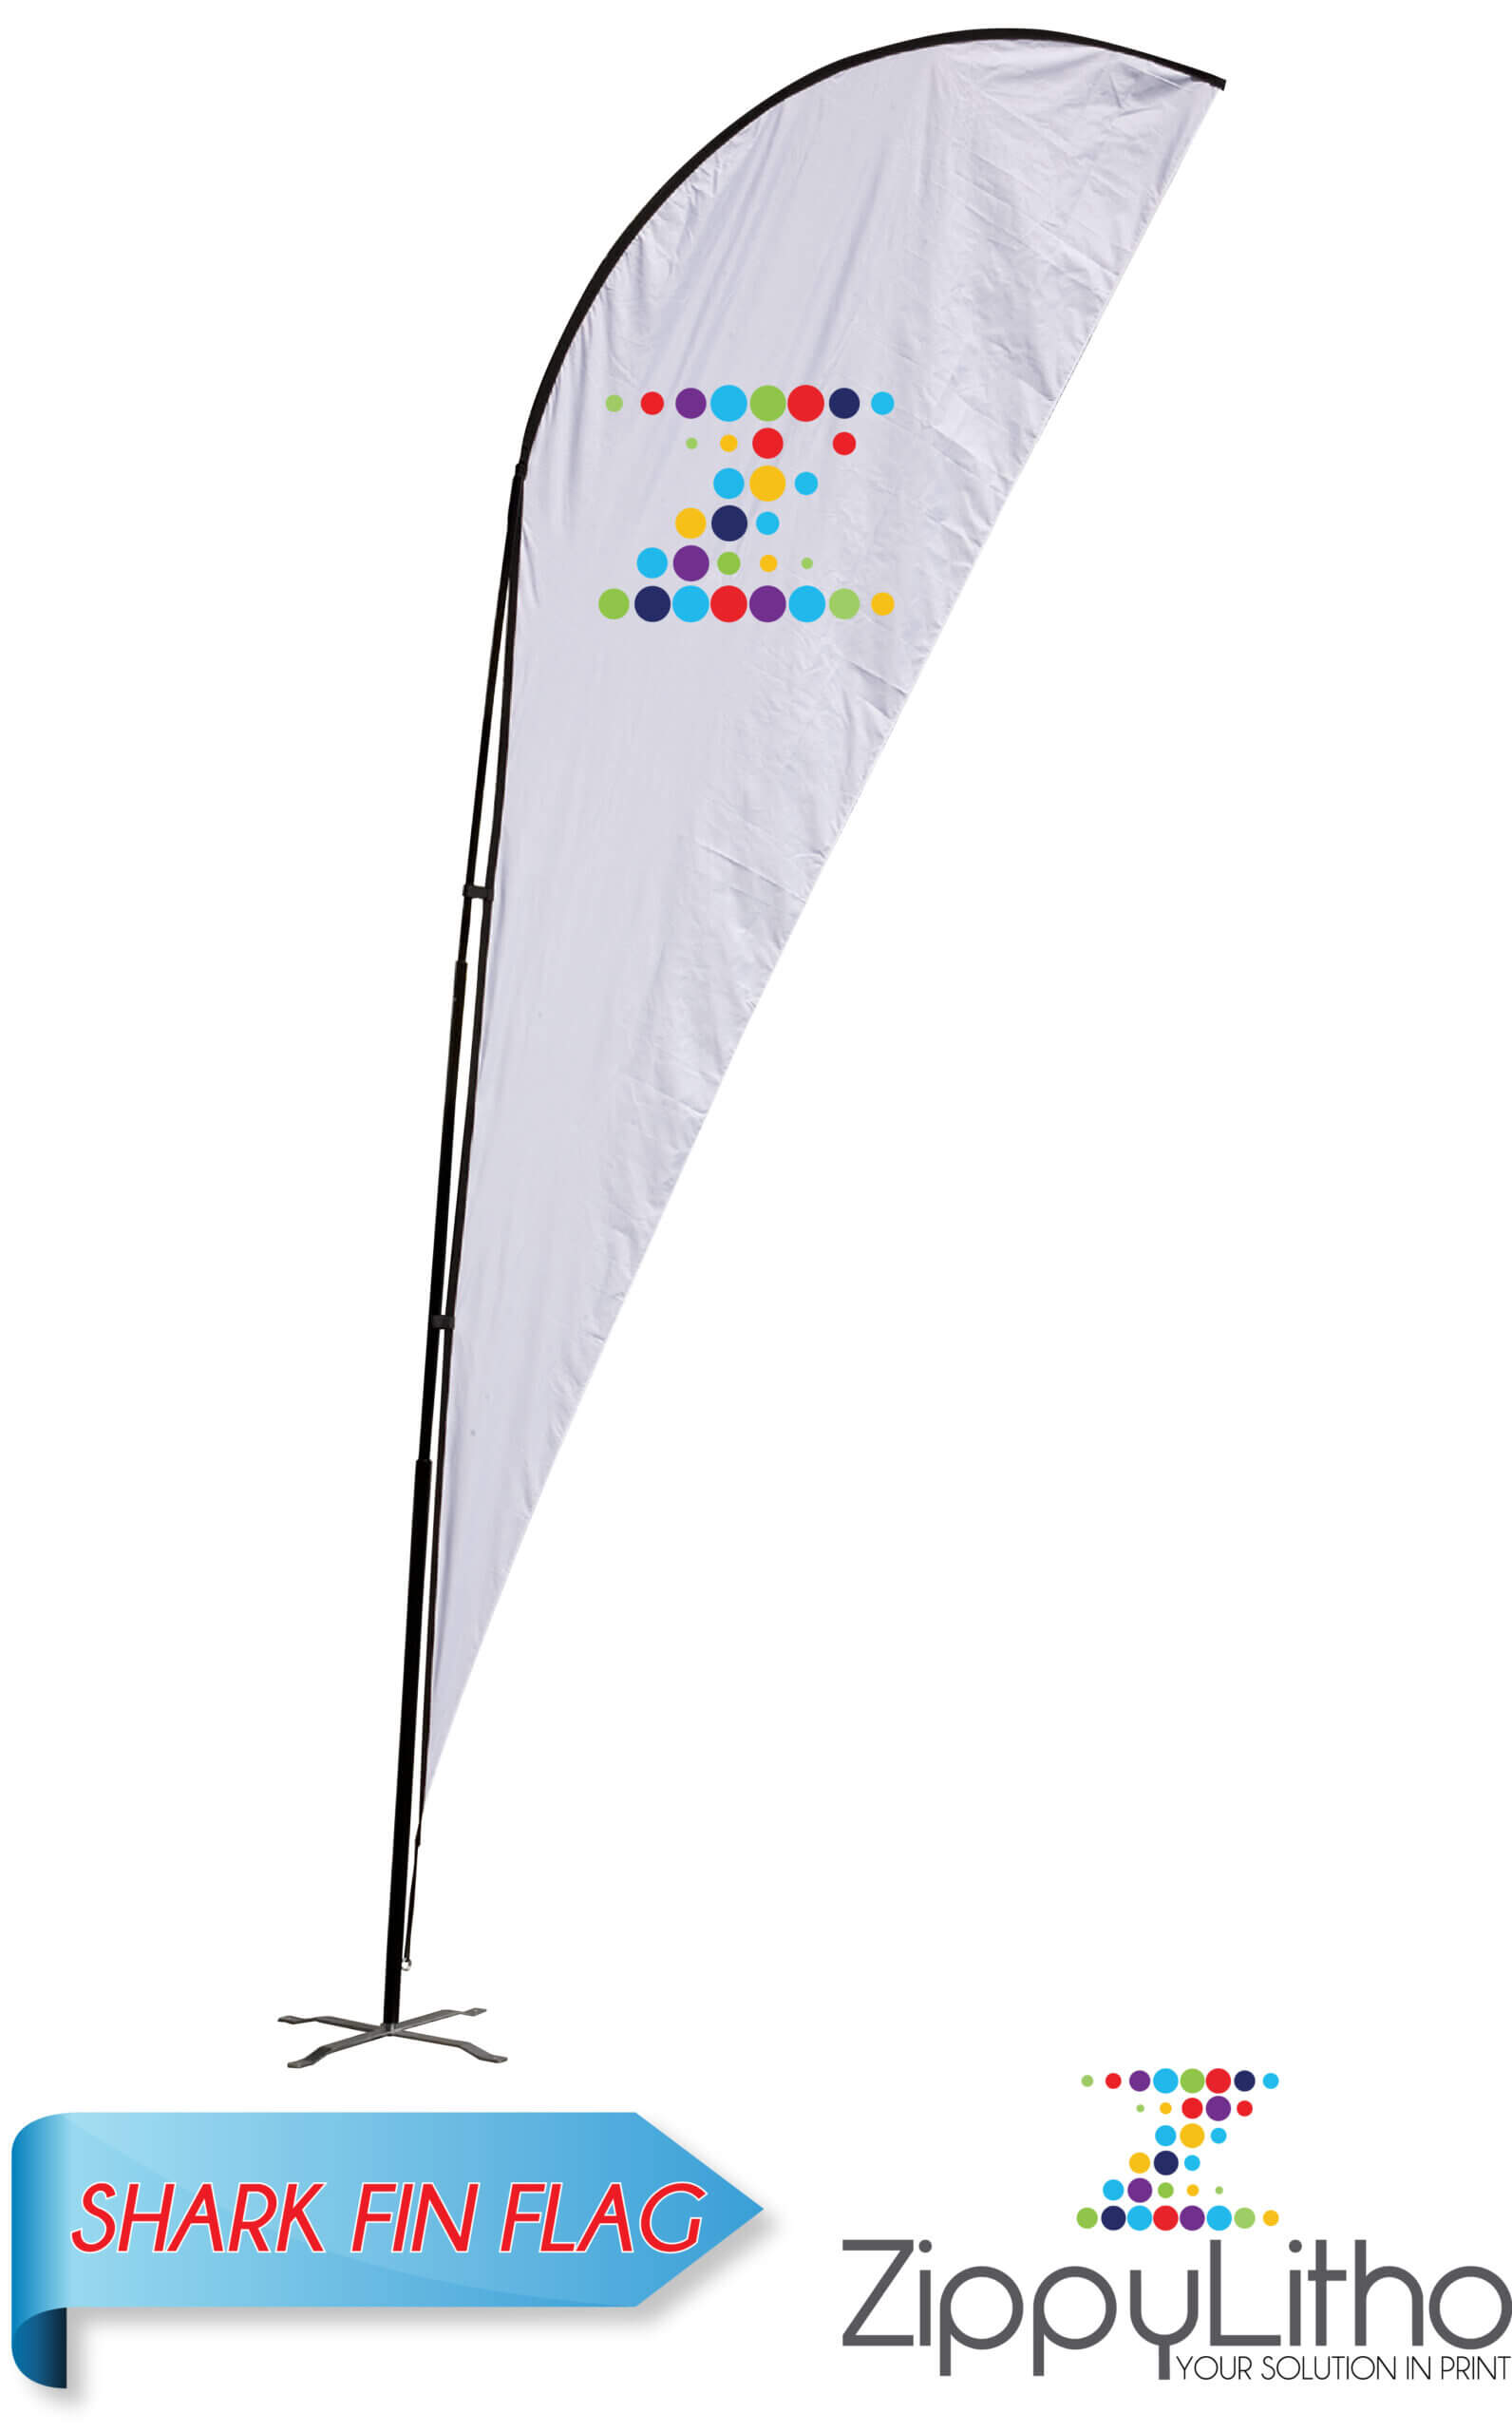 Shark Fin Flag   Zippy Litho Pertaining To Sharkfin Banner Template